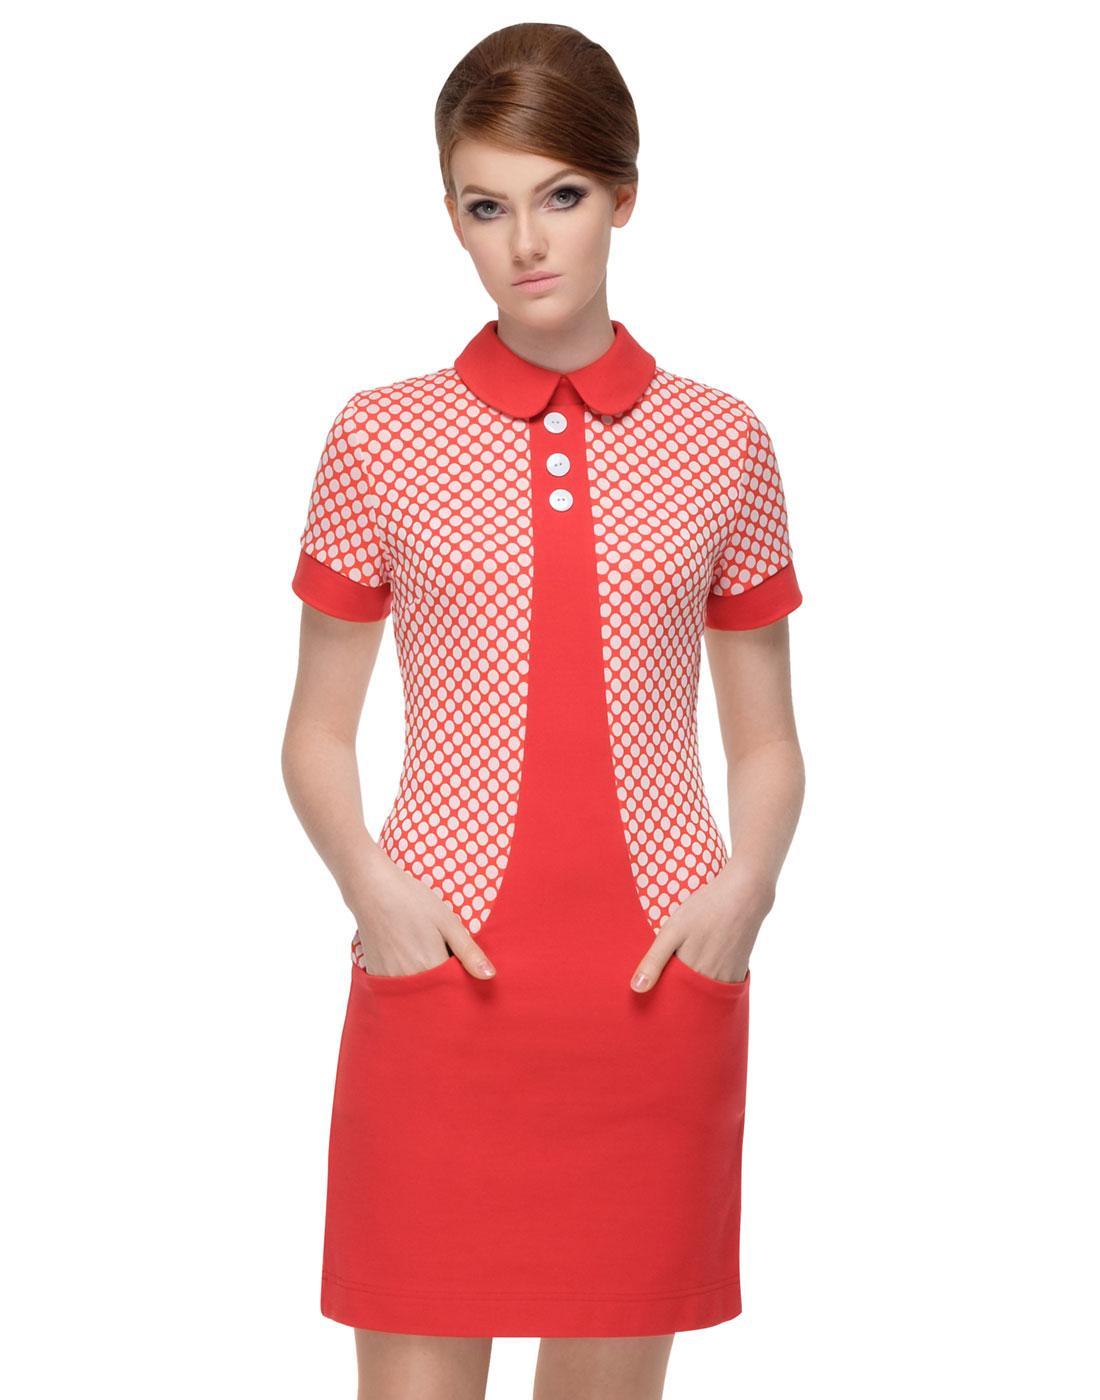 MARMALADE Retro 60s Mod Polka Dot Pocket Dress